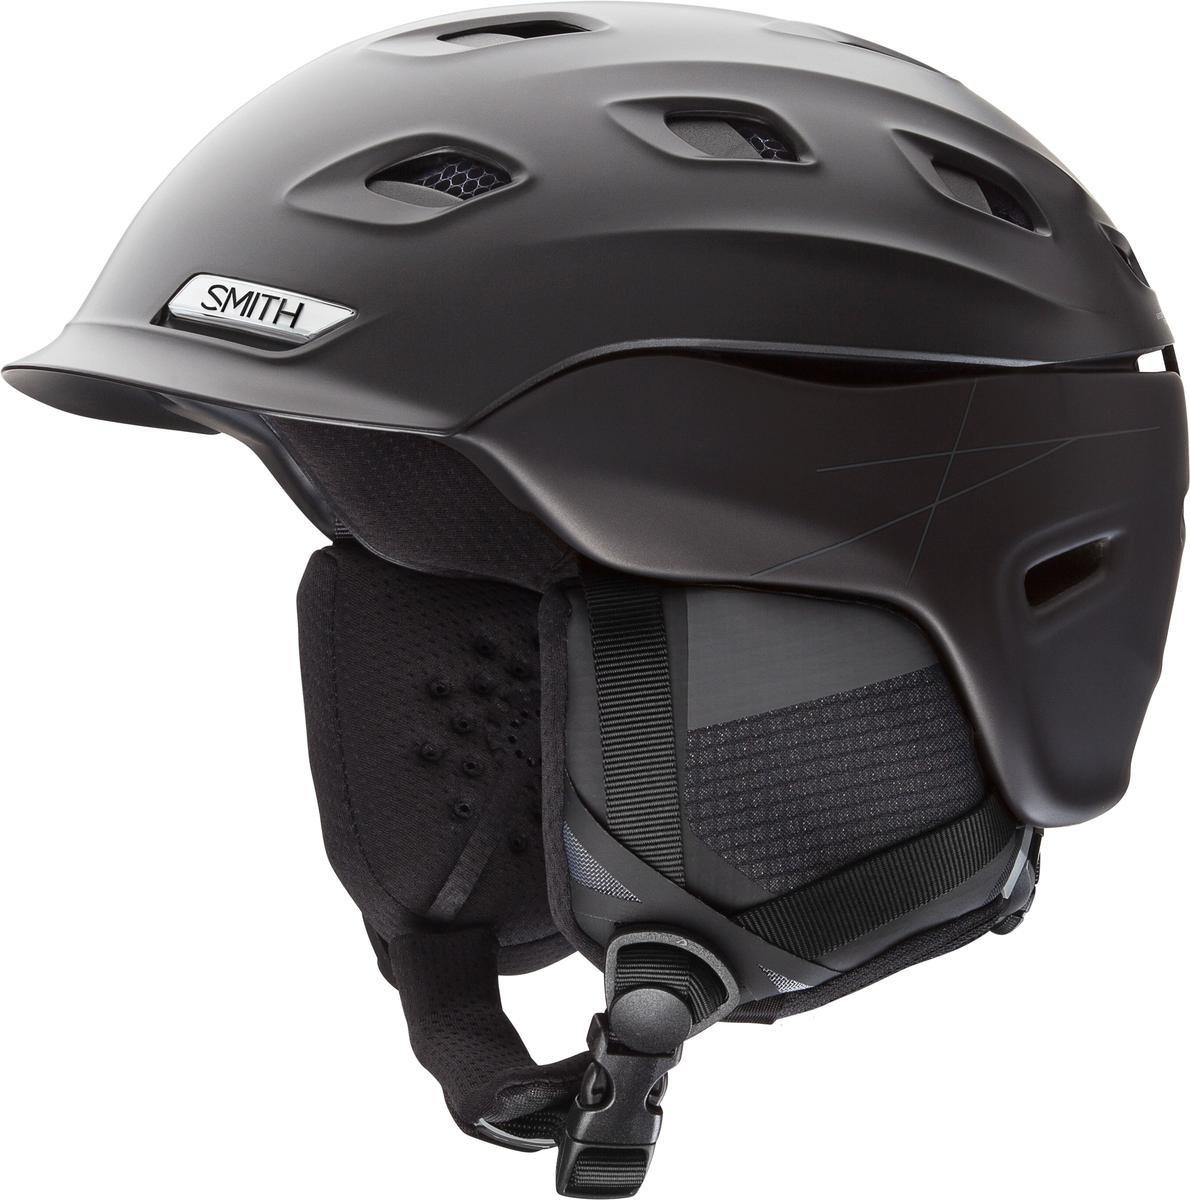 Smith Optics Vantage MIPS Adult Snow Snowmobile Helmet Matte Gunmetal